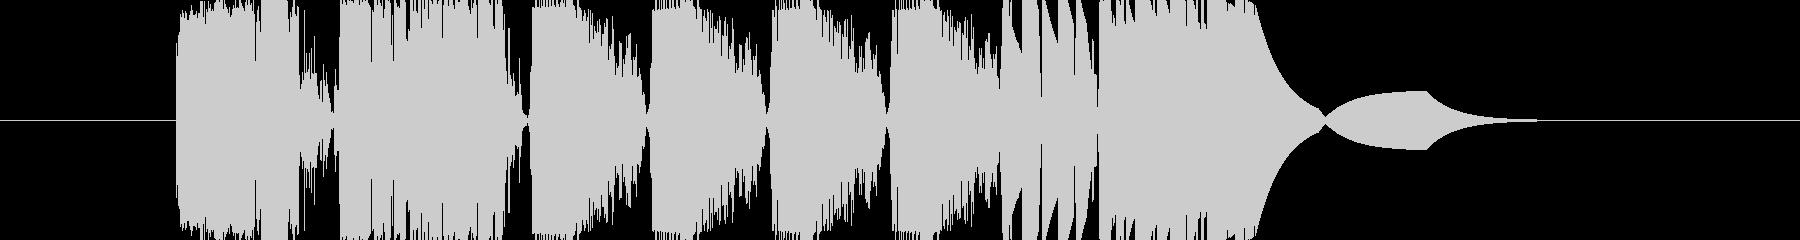 CRAZYDRUMSバージョン8の未再生の波形